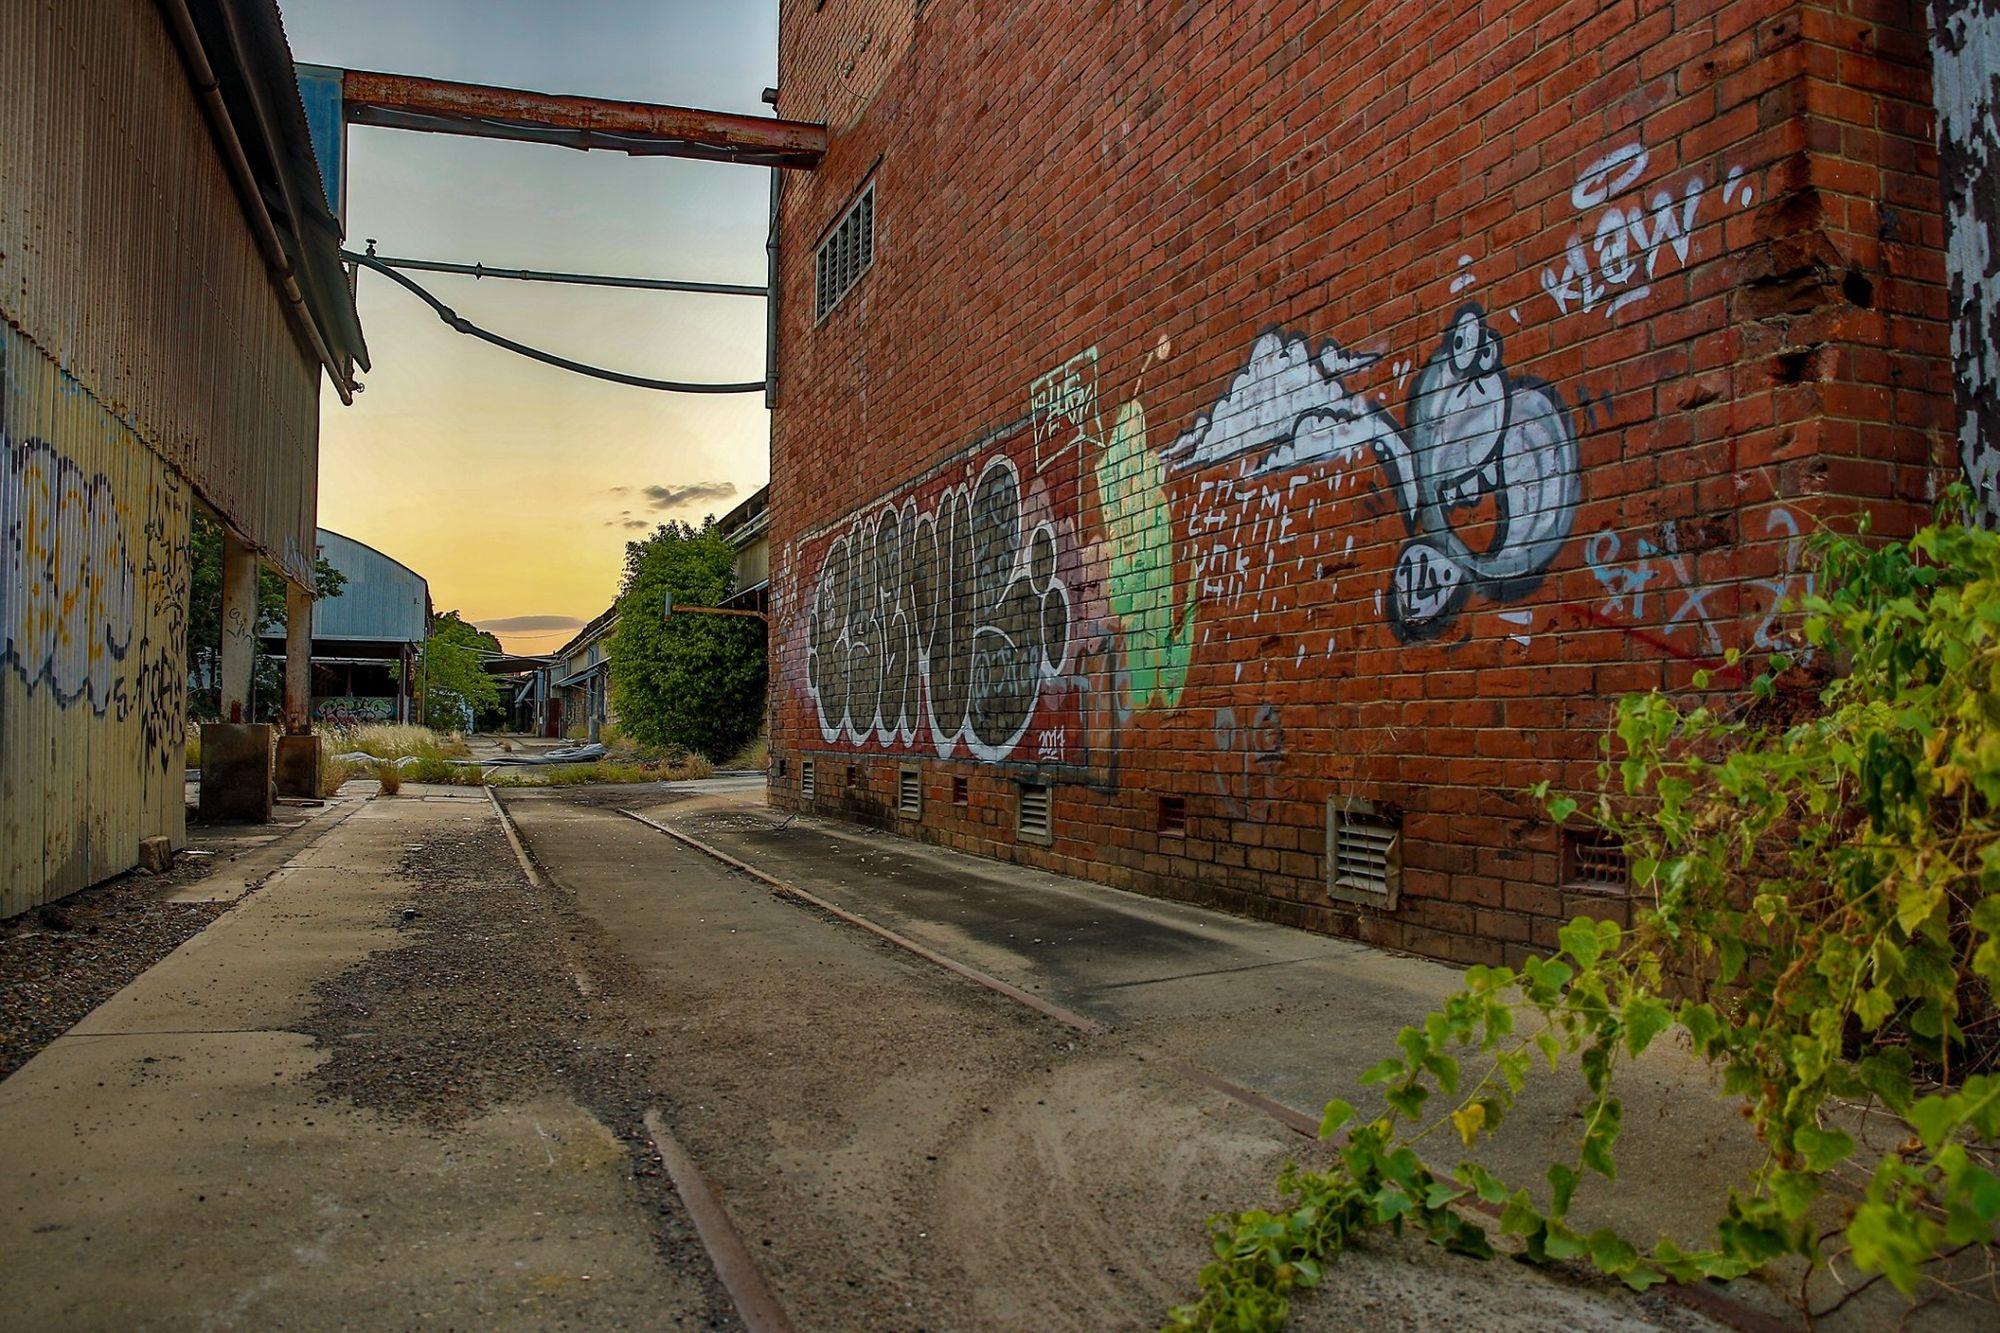 railyards buildings graffiti townsville